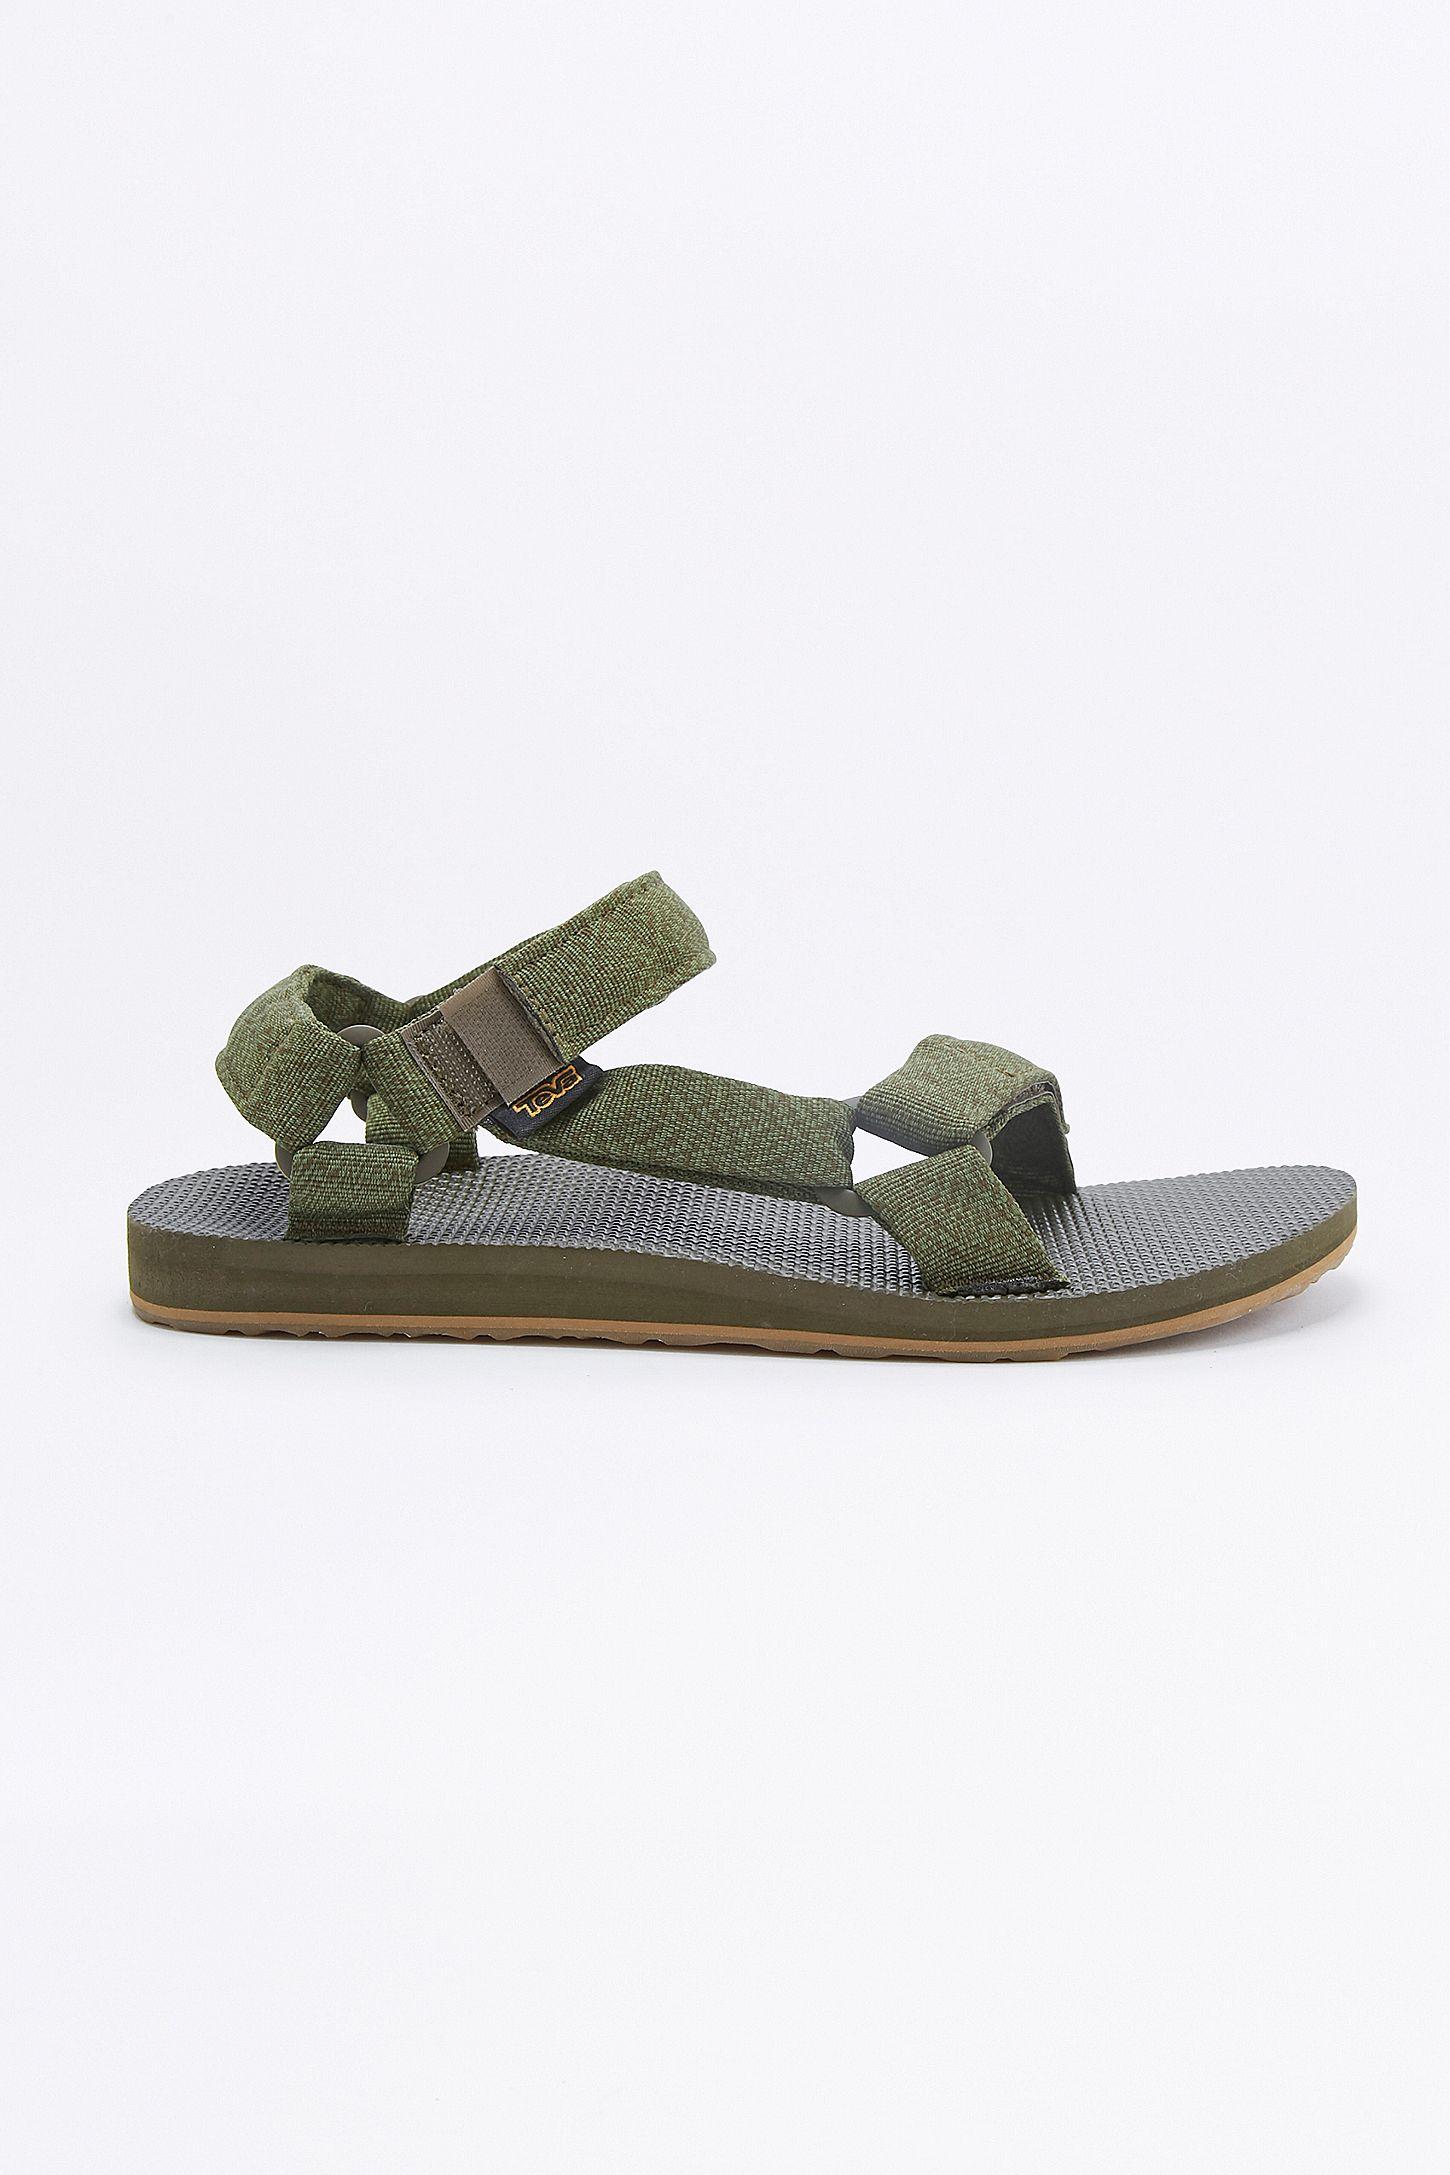 a64f5c985ae9 Teva Original Universal Khaki Sandals